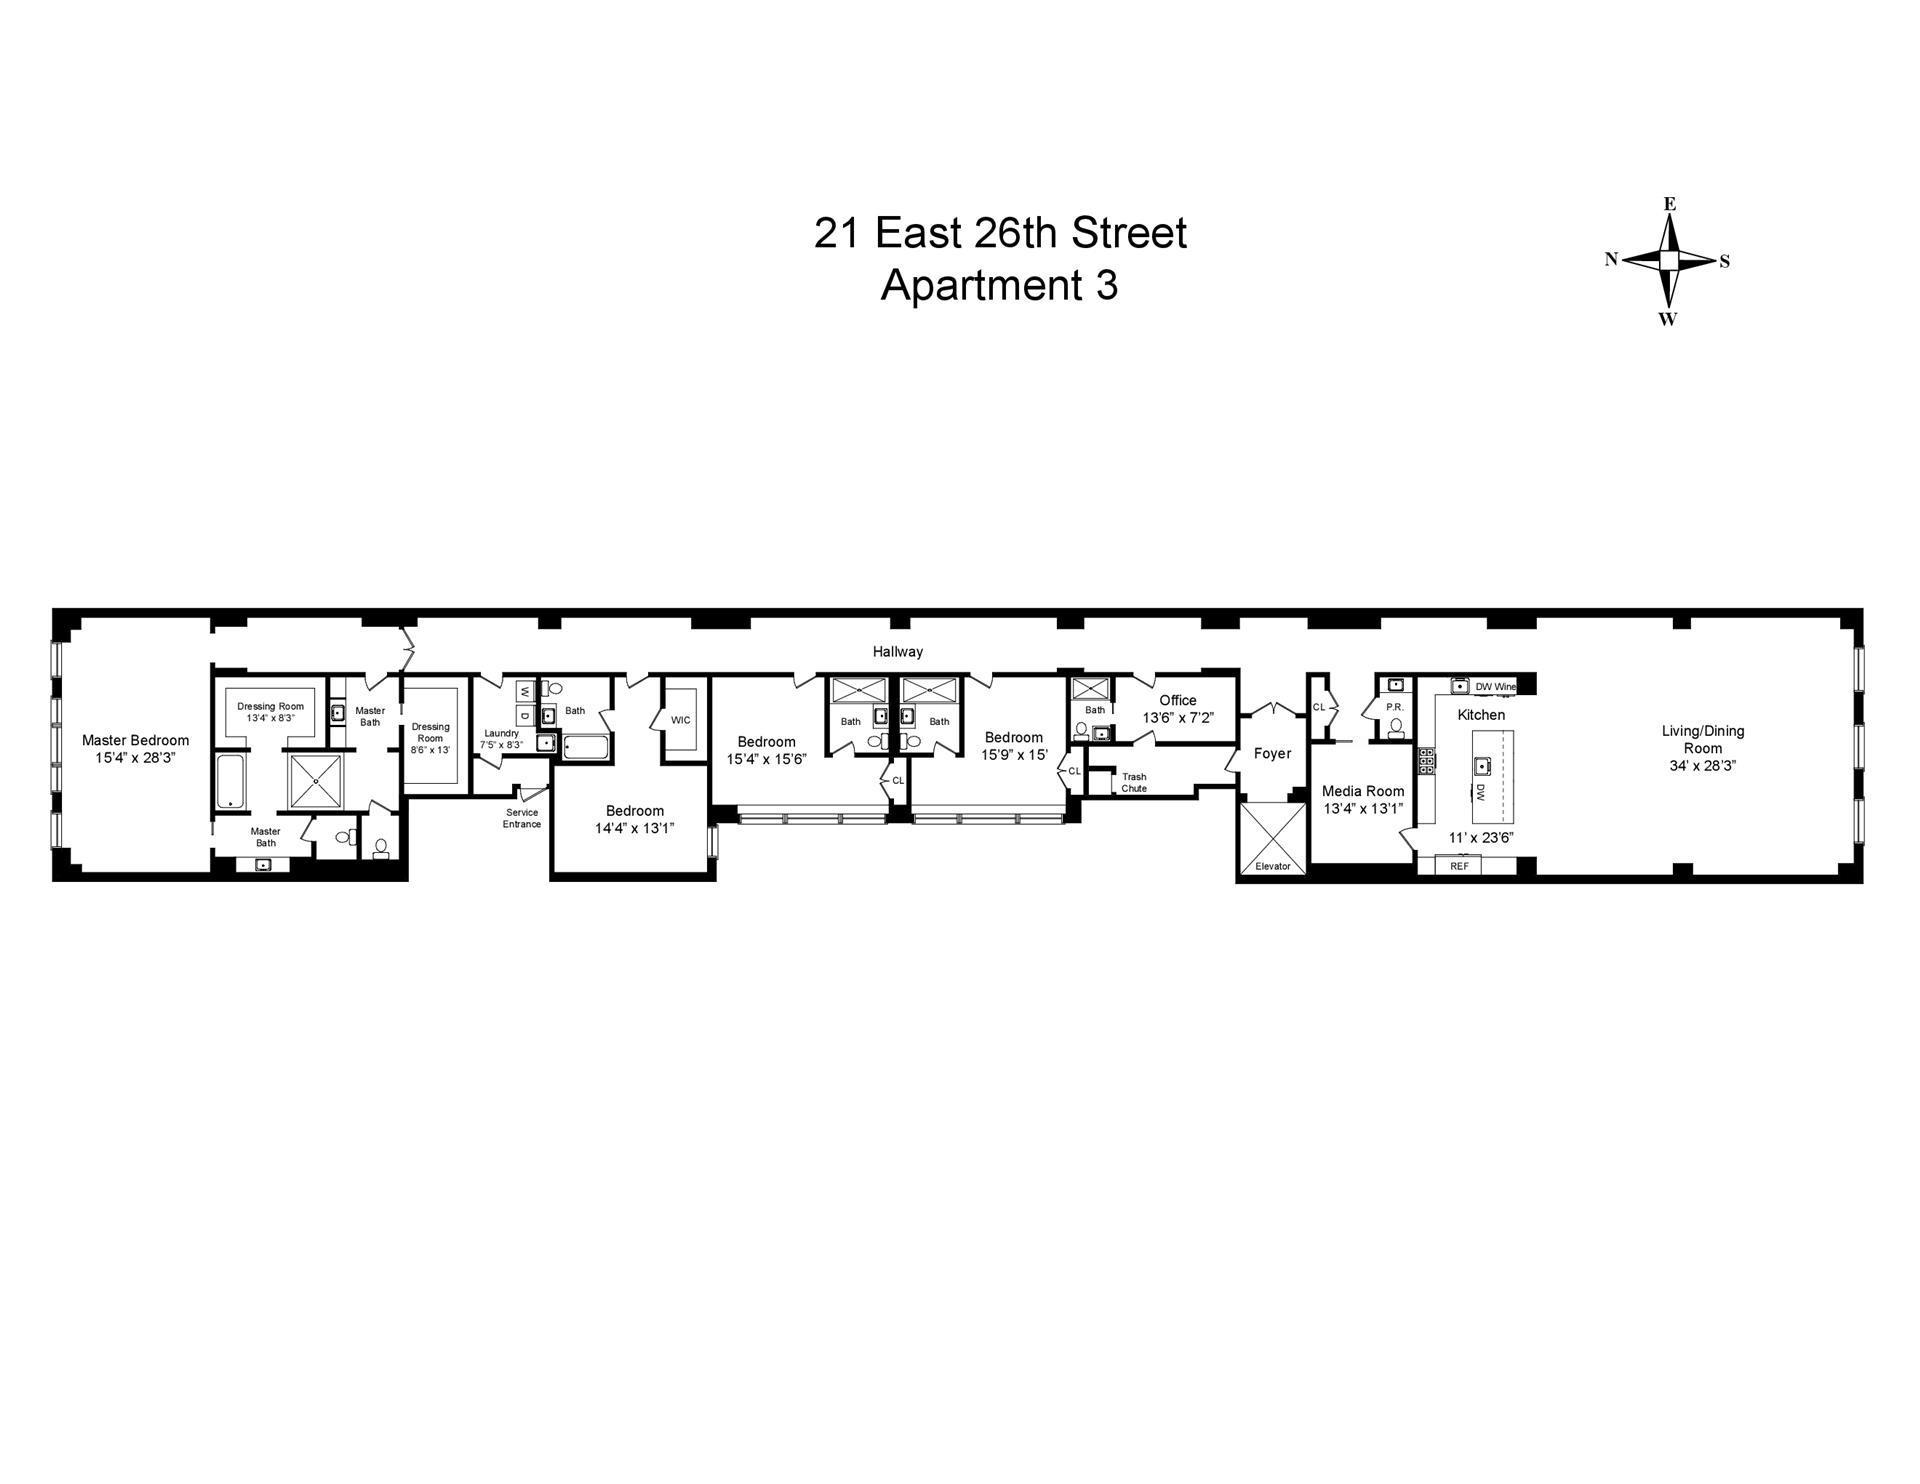 Floor plan of The Whitman, 21 East 26th Street, 3 - NoMad, New York